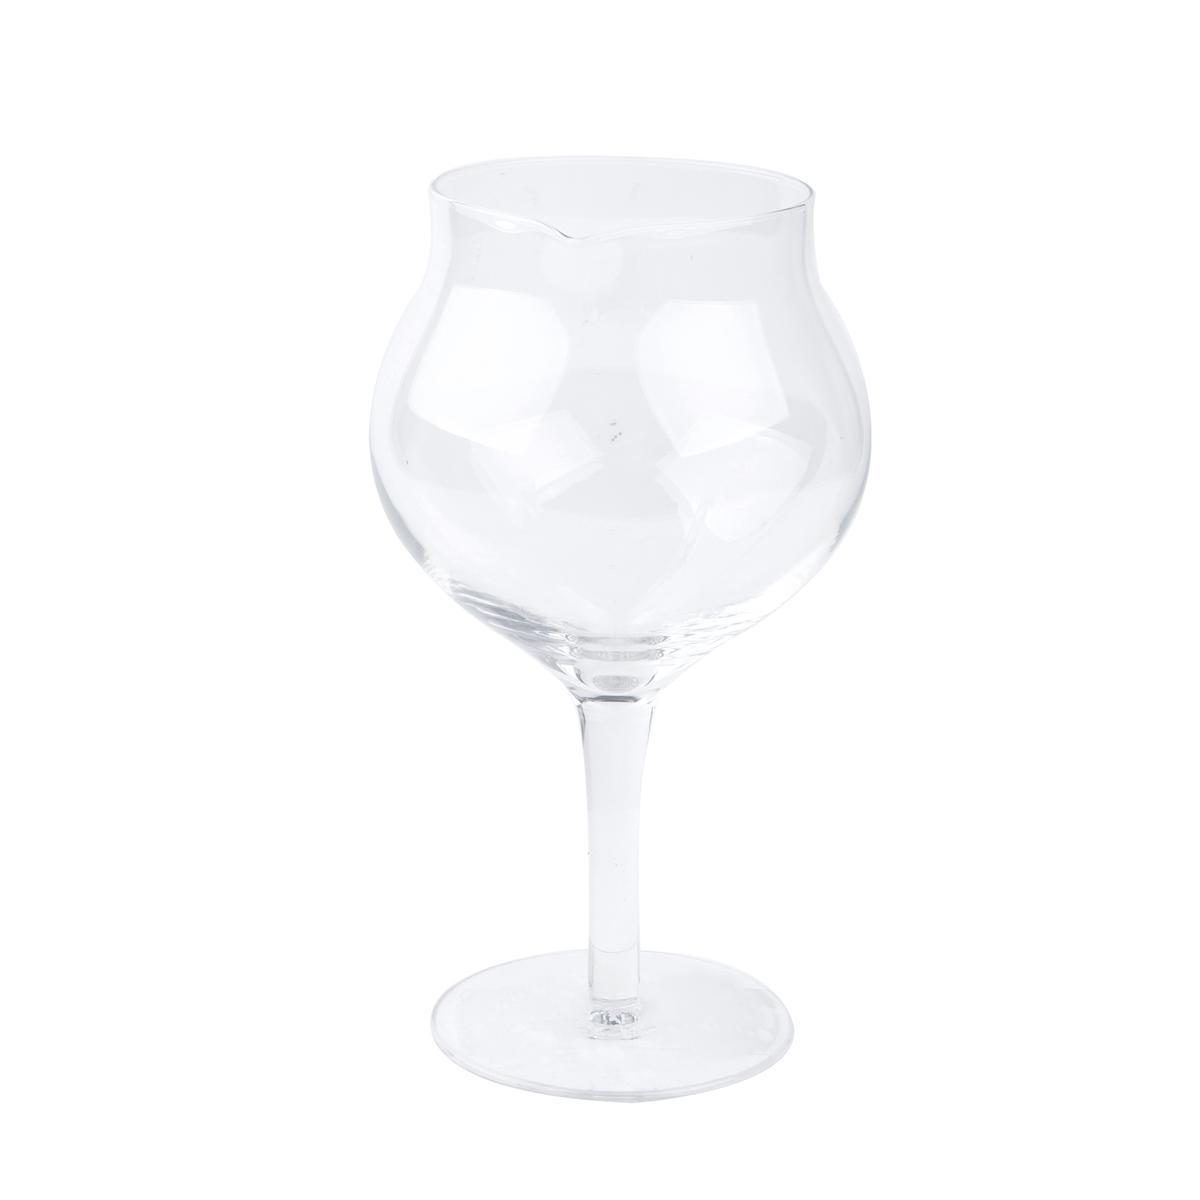 carafe a decanter forme verre a pied